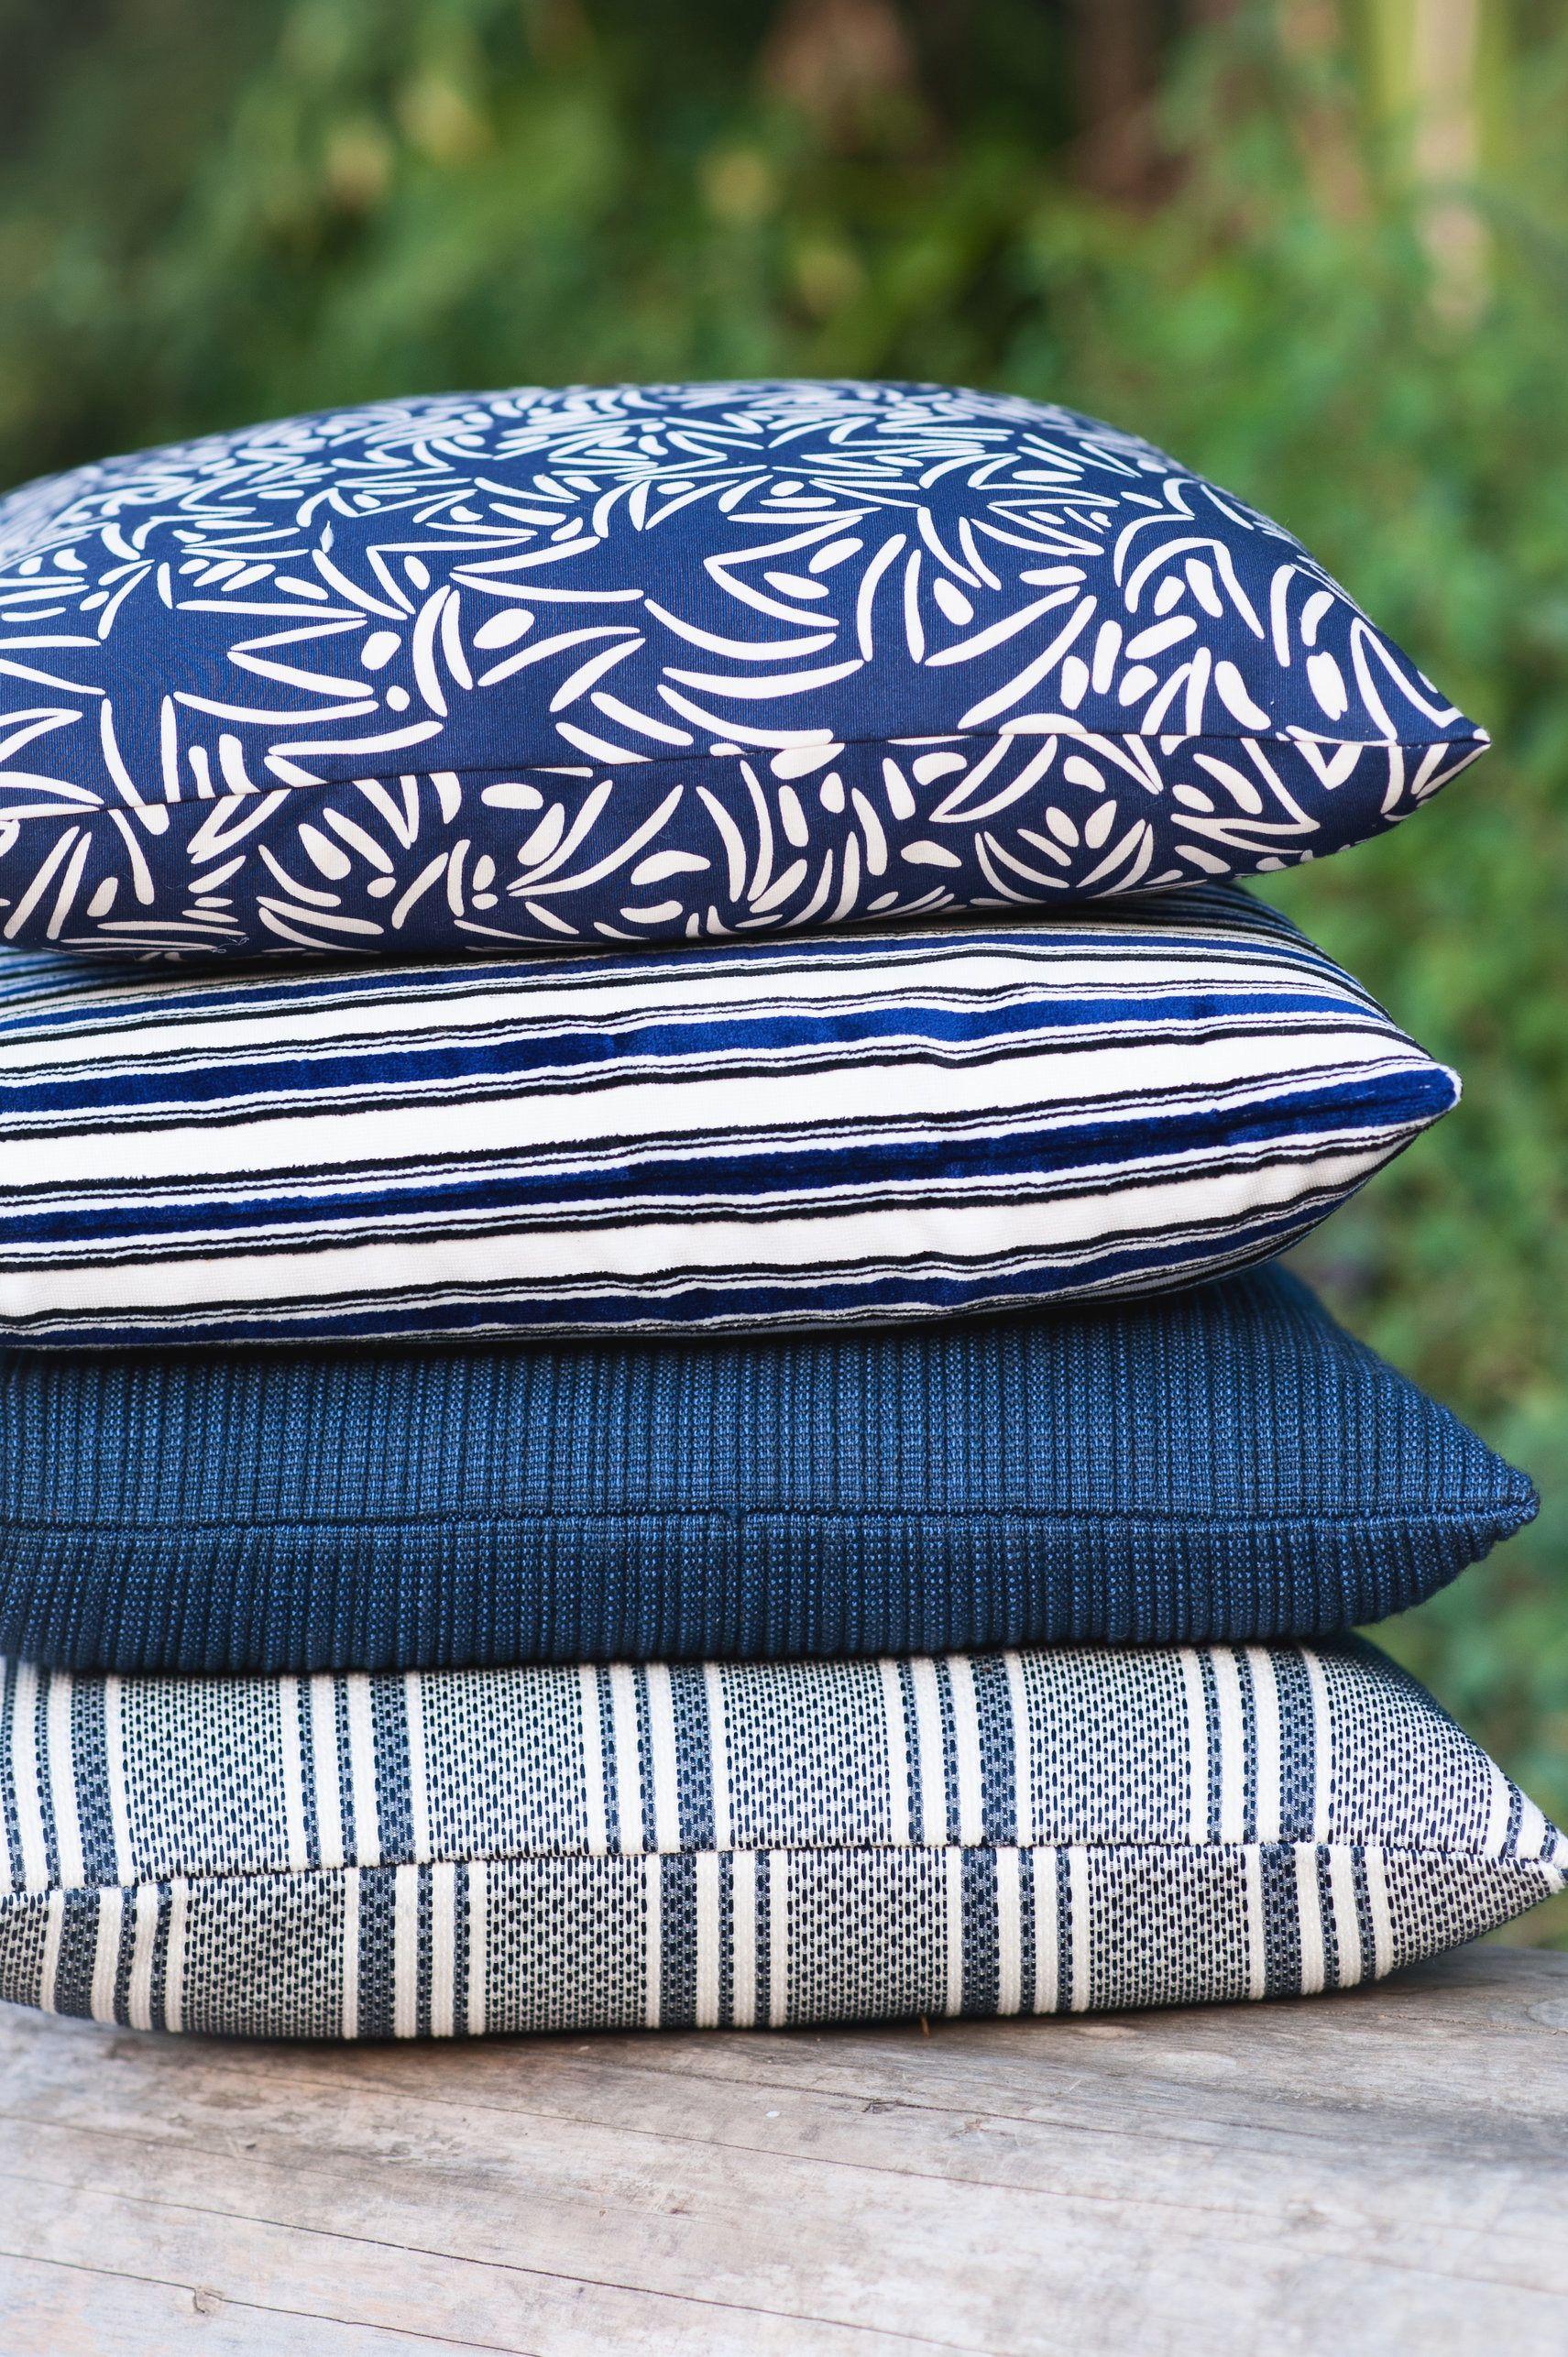 home bobois of pillow design boho jong sofas beautiful sofa luxury modular fresh setting pillows mah sale missoni roche